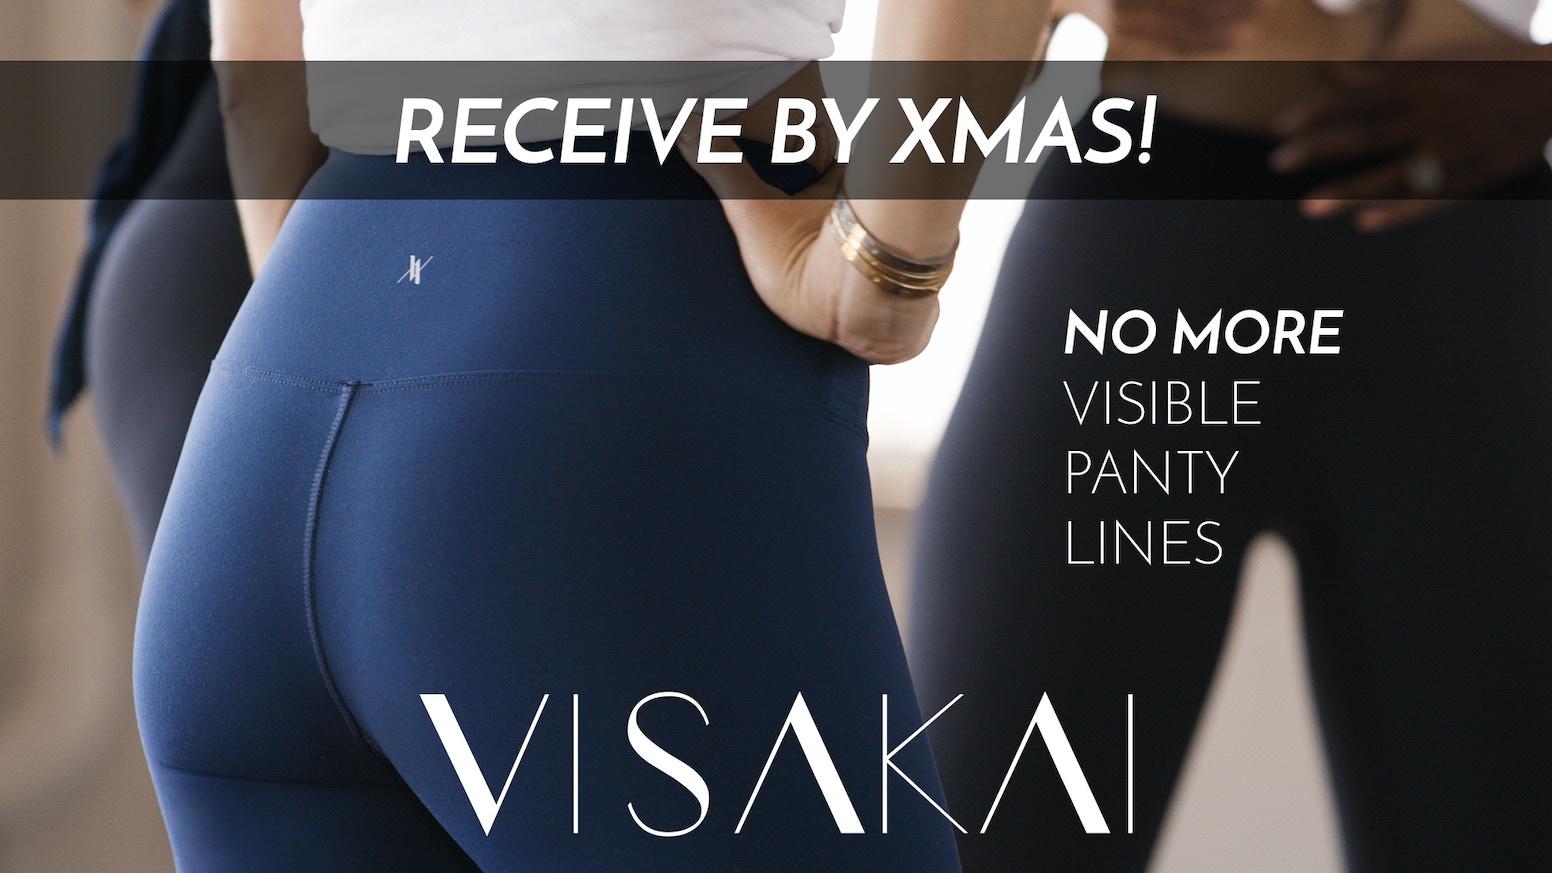 VISAKAI Leggings: No more Visible Panty Lines